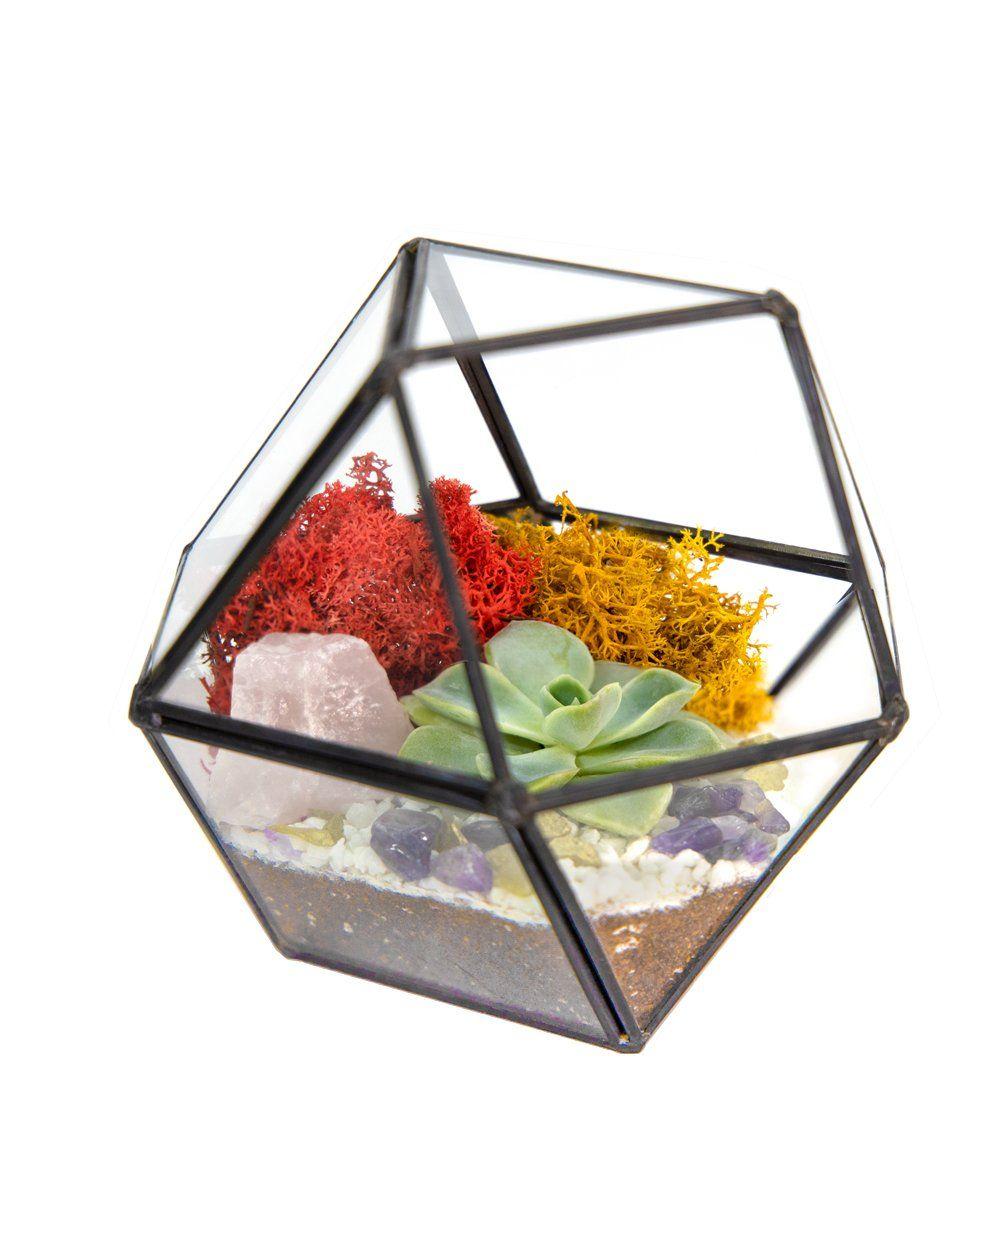 "Photo of 4""x5"" Geo Glass Succulent Terrarium with Metal Stand, Moss, Rocks, Amethyst *DIY Live Plant Terrarium Kit* – Gold/Mint / Quartz Geode"